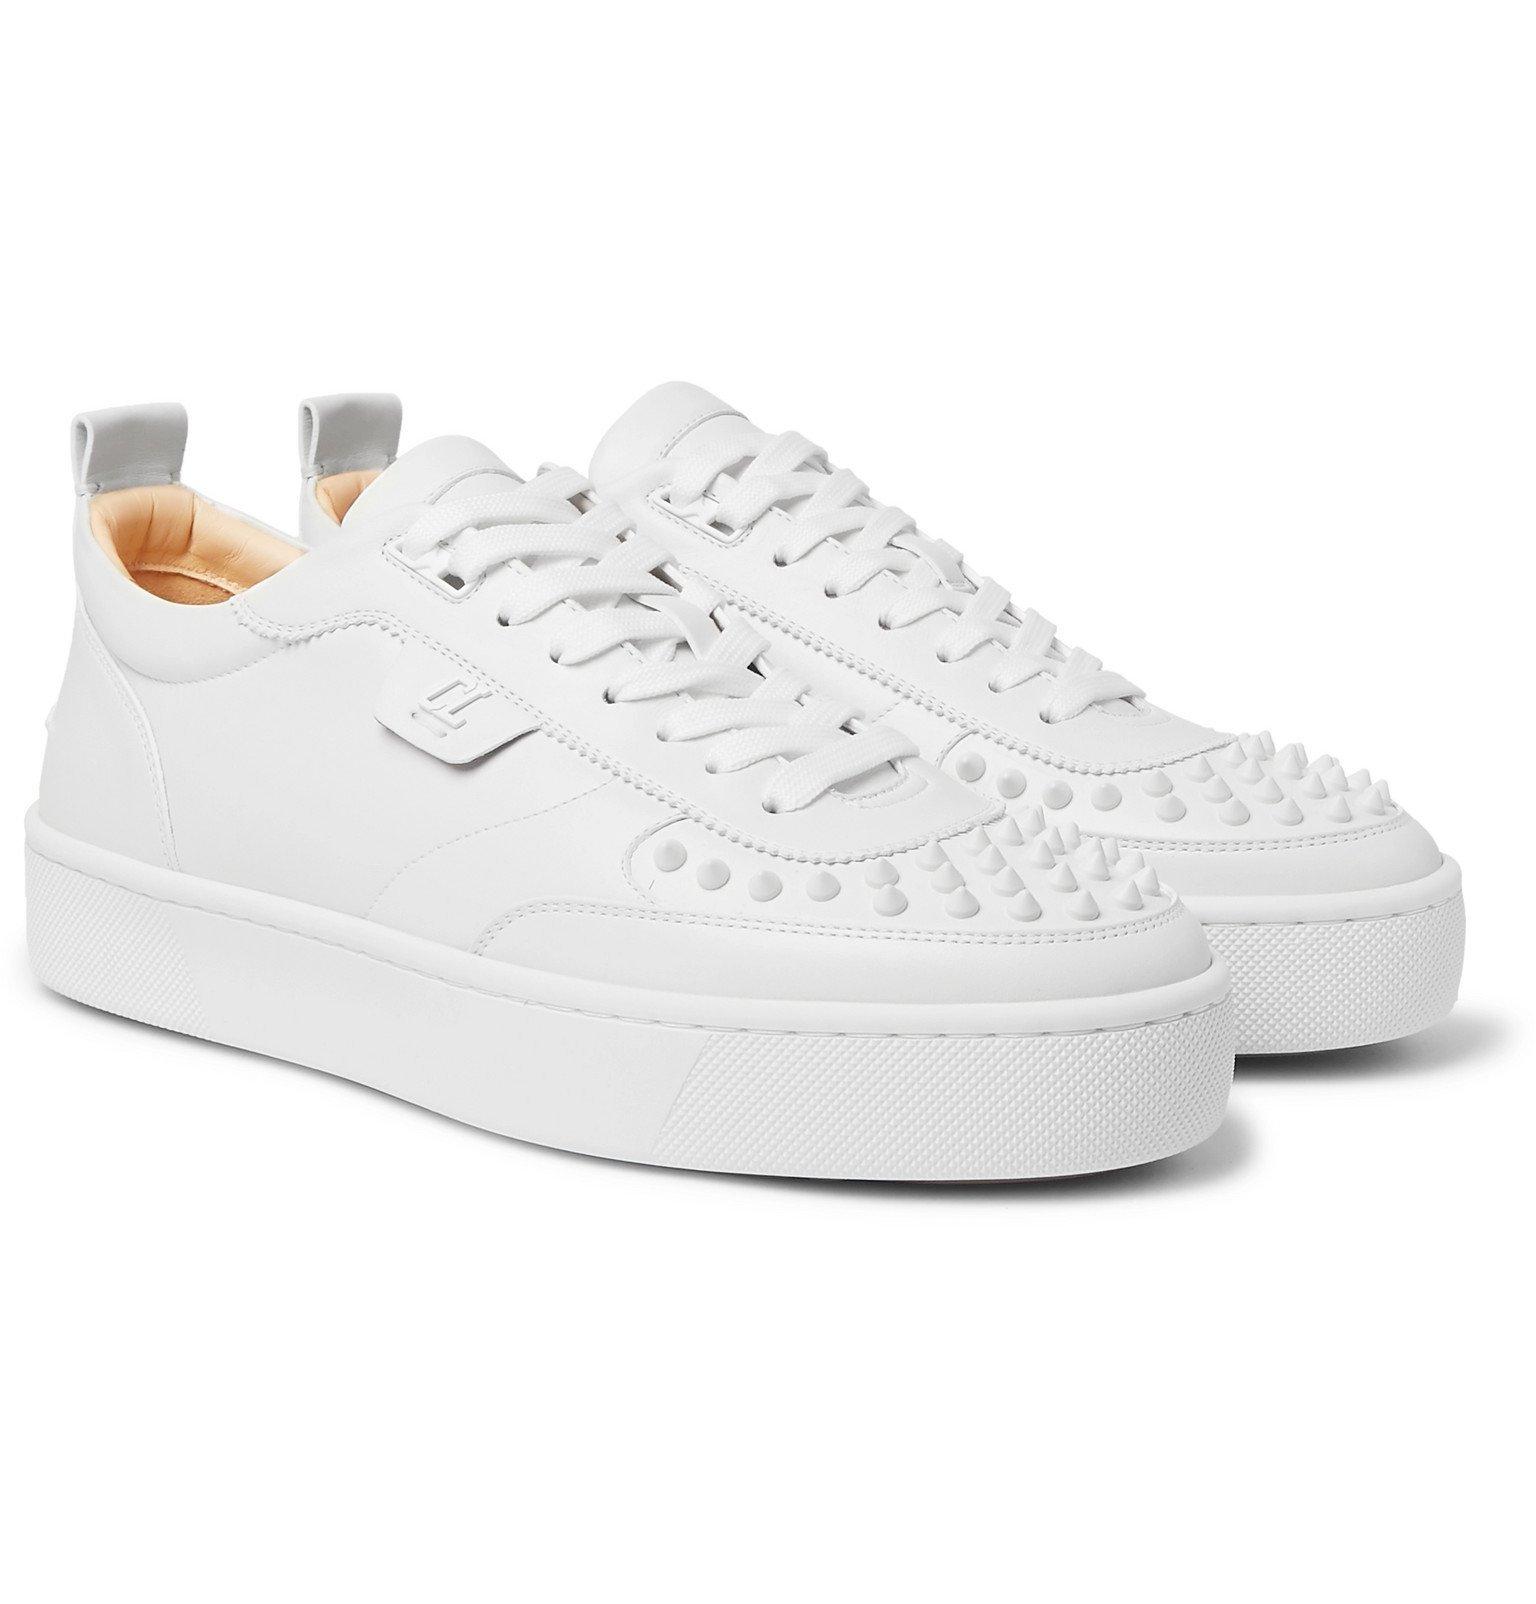 christian louboutin sneakers amsterdam